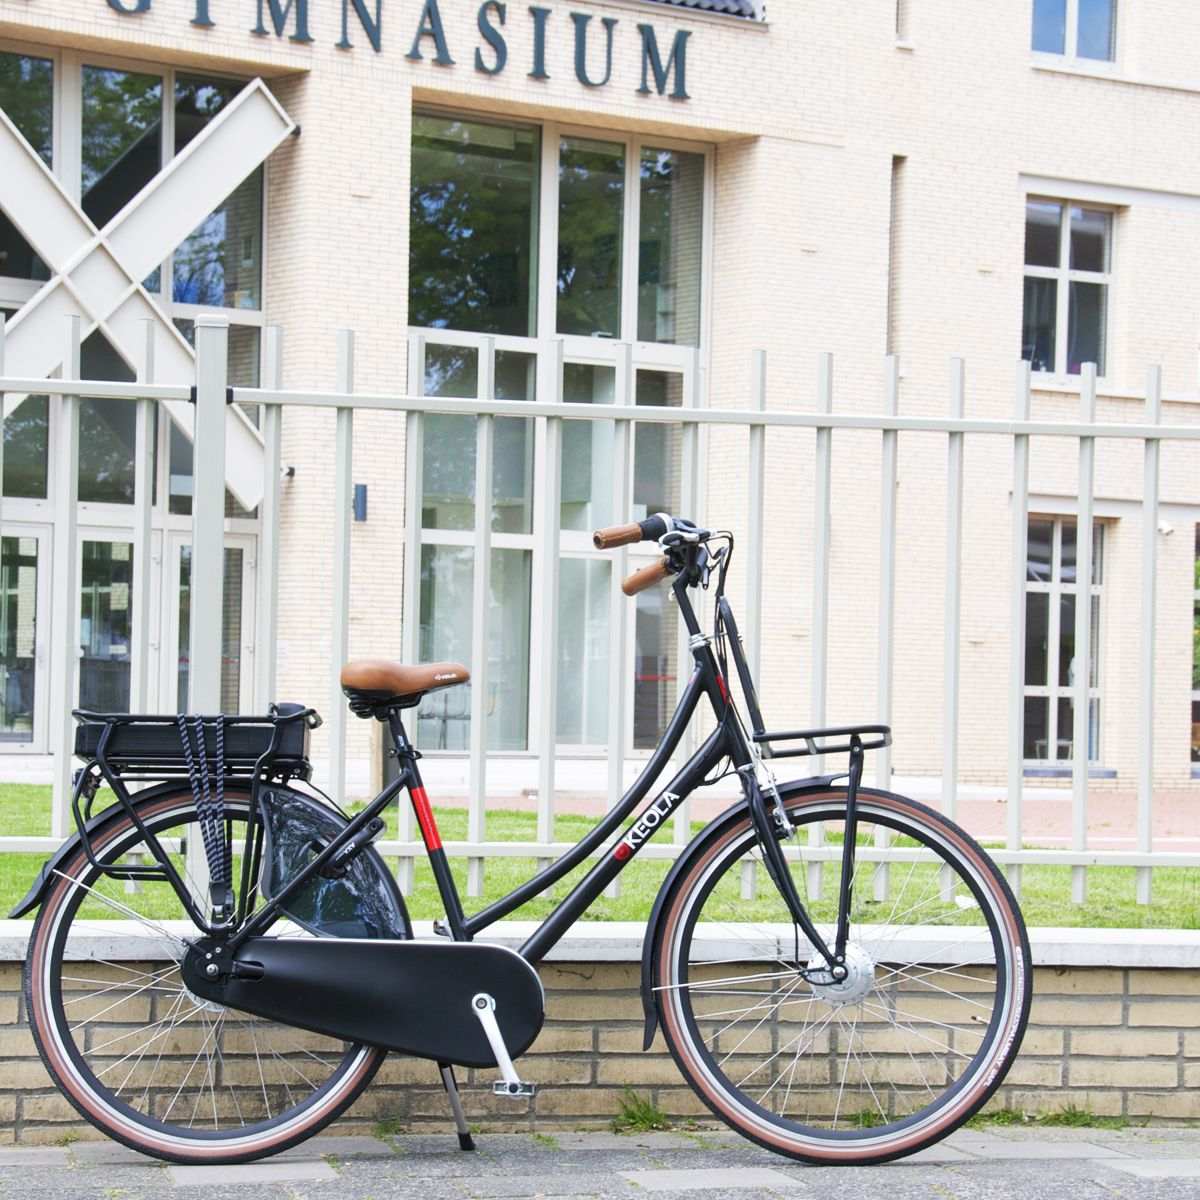 keola holland e bike lifepo4 battery keola in the city. Black Bedroom Furniture Sets. Home Design Ideas